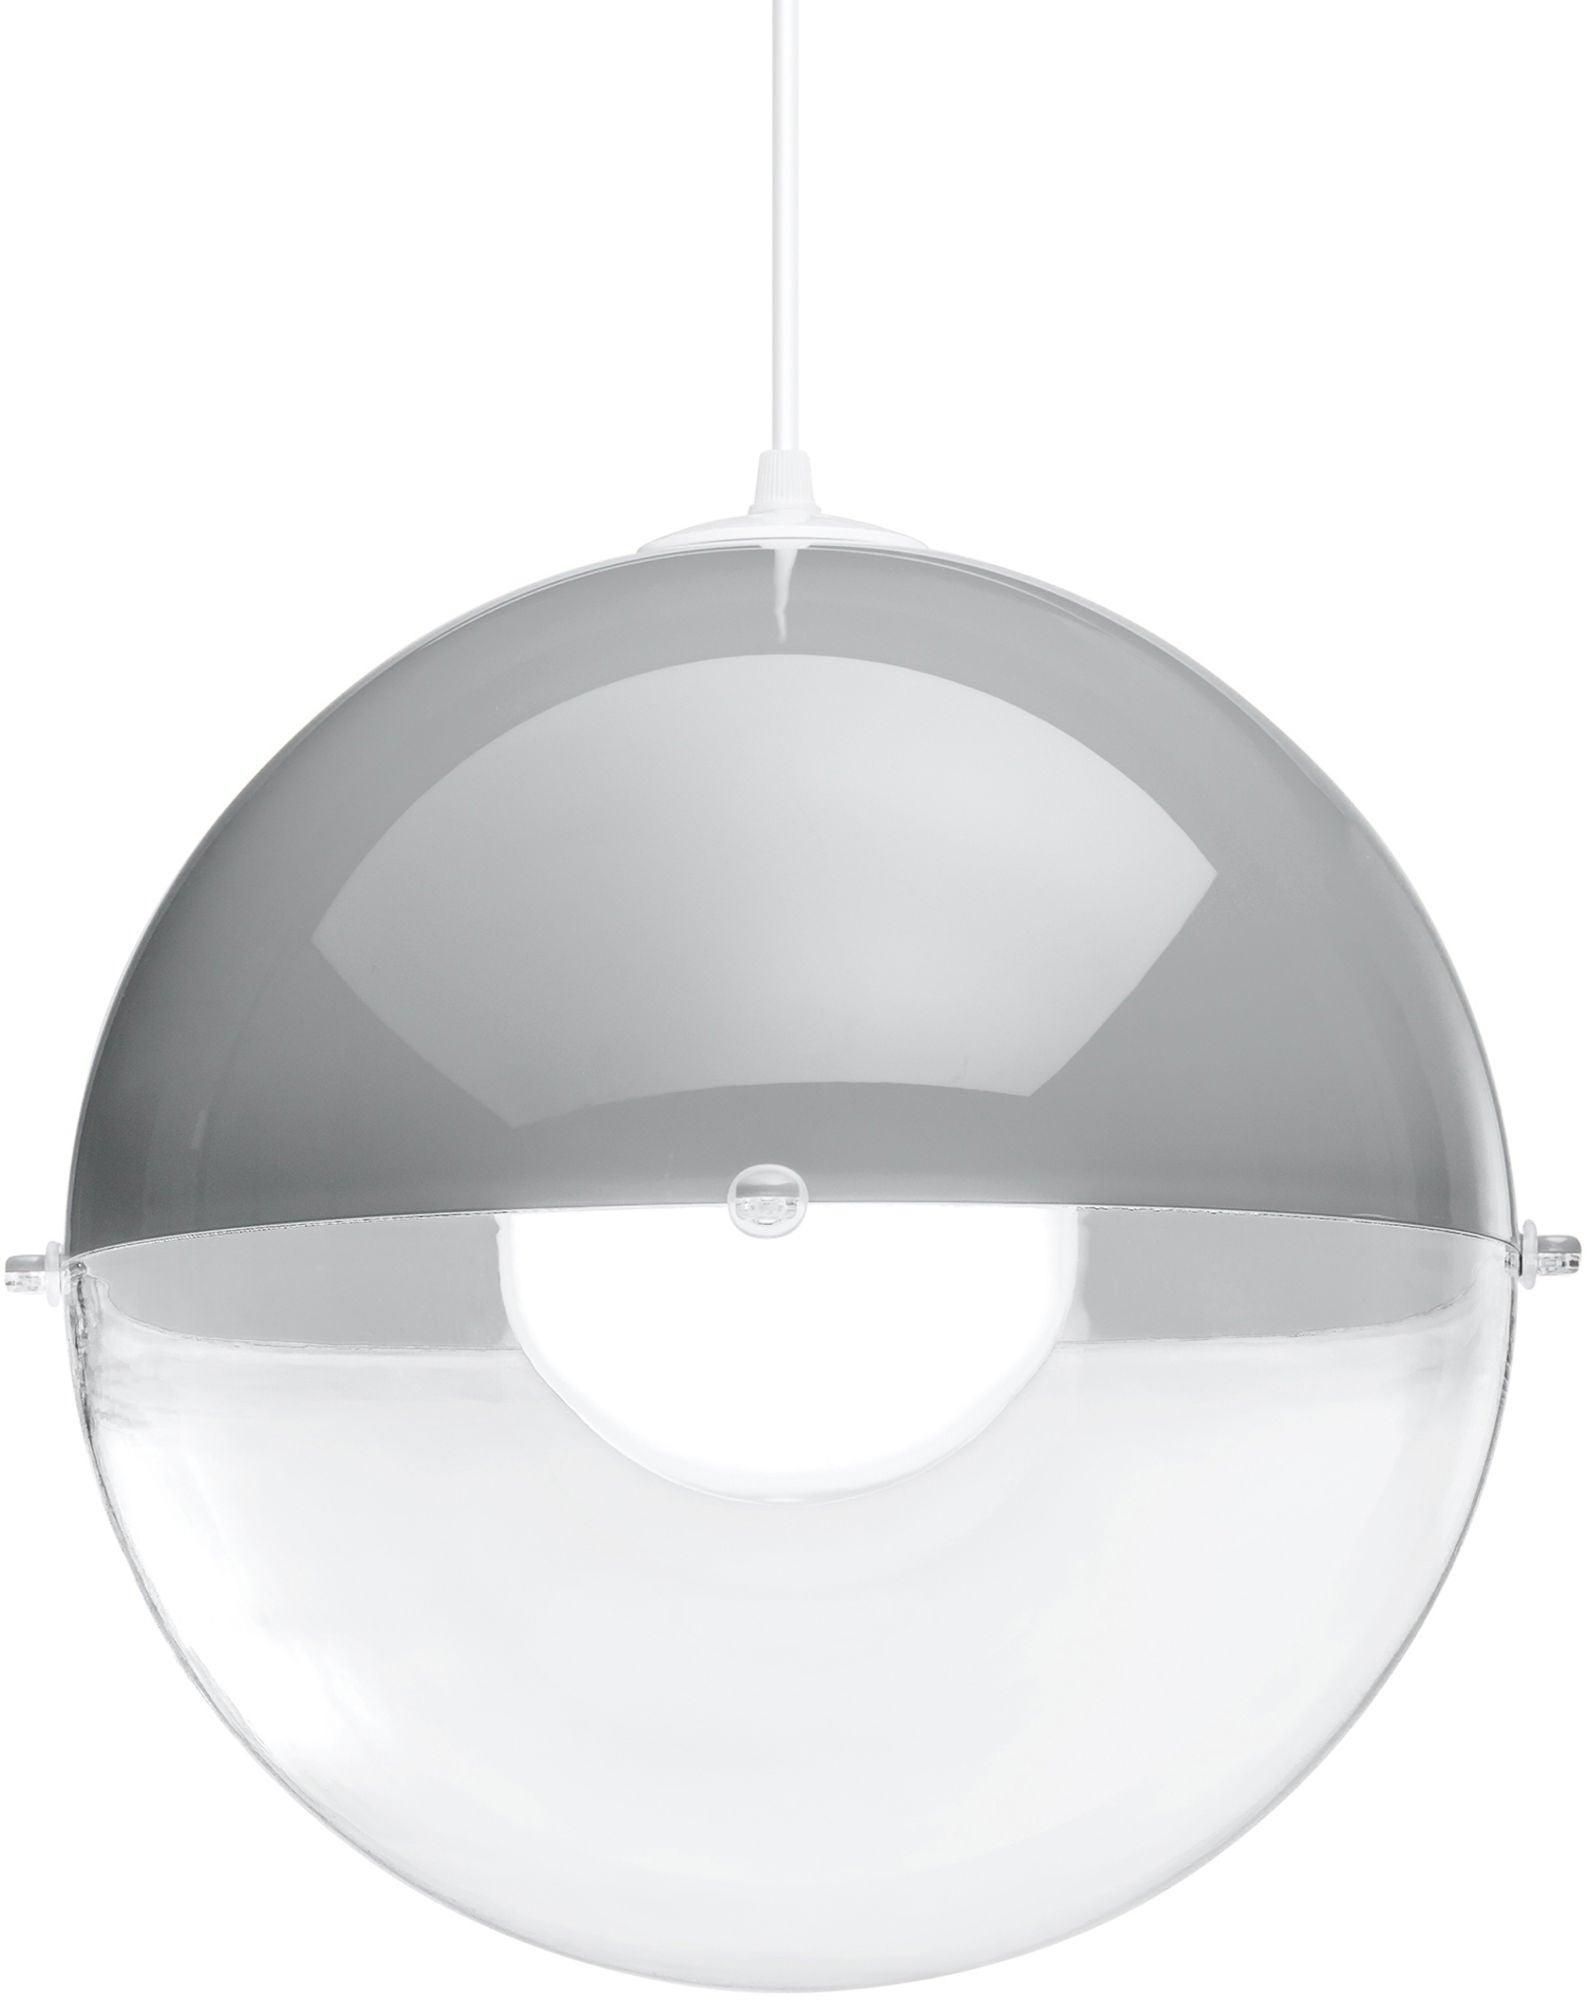 Koziol Kattovalaisin Orion Transparent, Harmaa